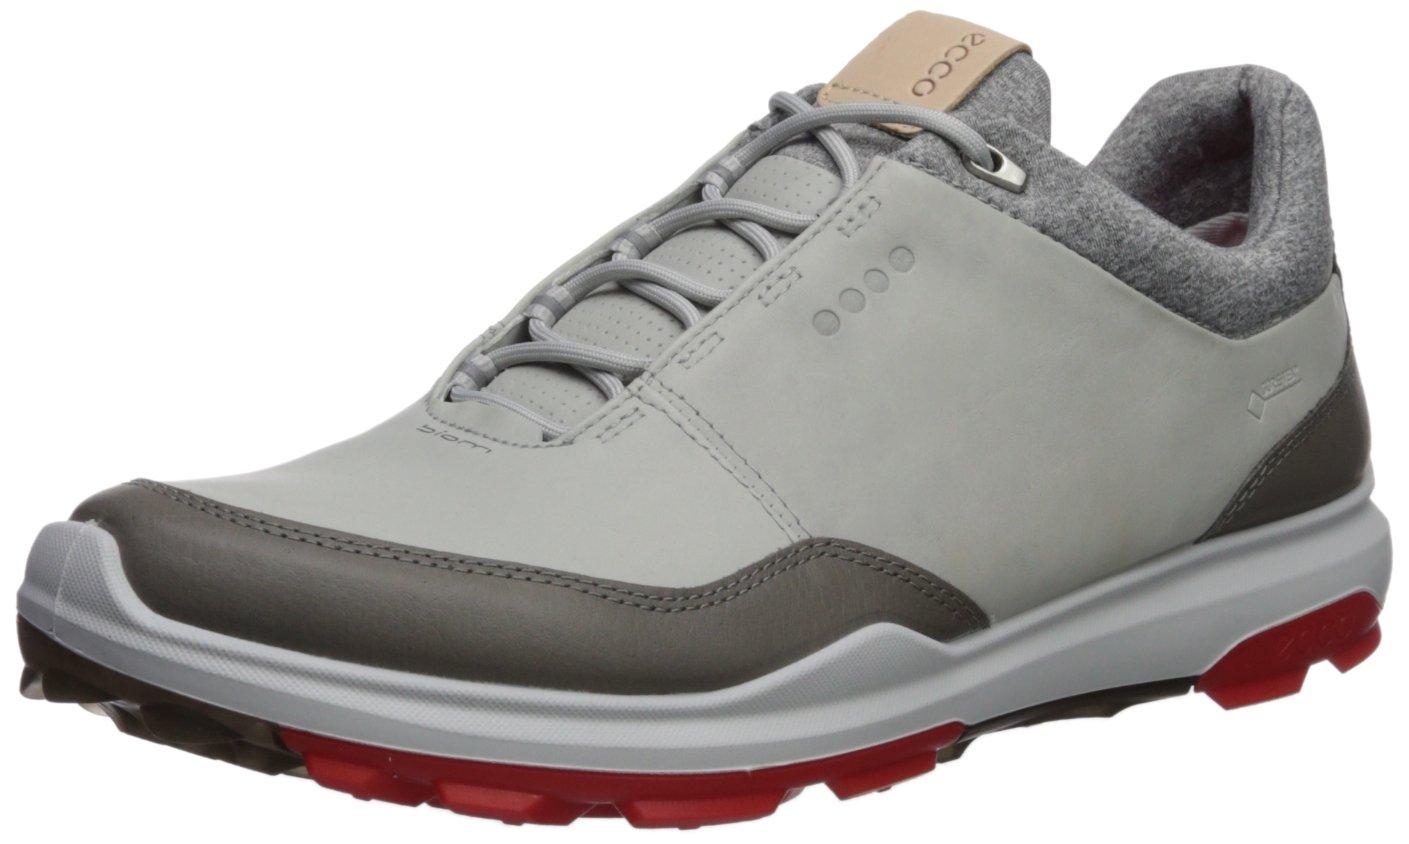 ECCO Men's Biom Hybrid 3 Gore-Tex Golf Shoe, Concrete/Scarlet Yak Leather, 8 M US by ECCO